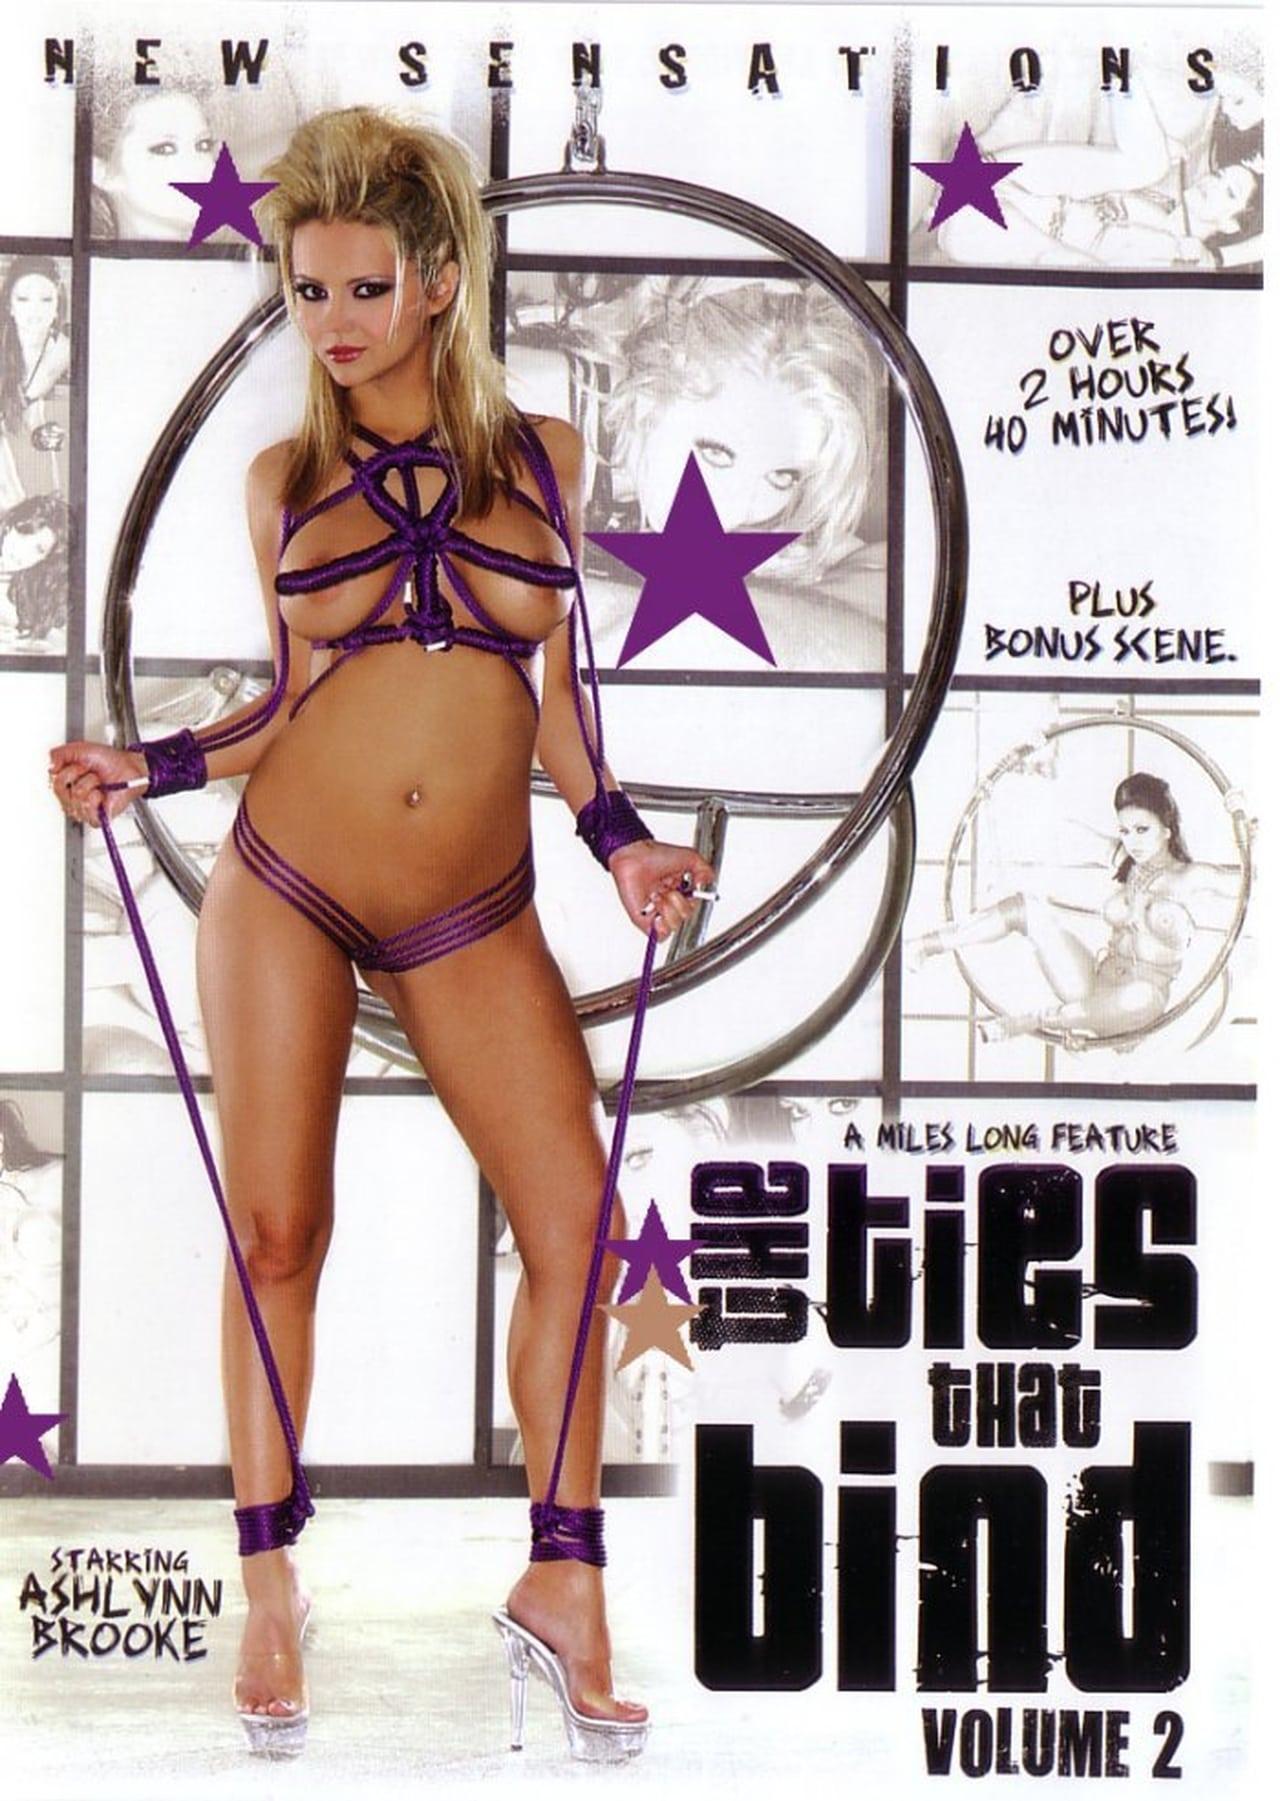 The Ties That Bind 2